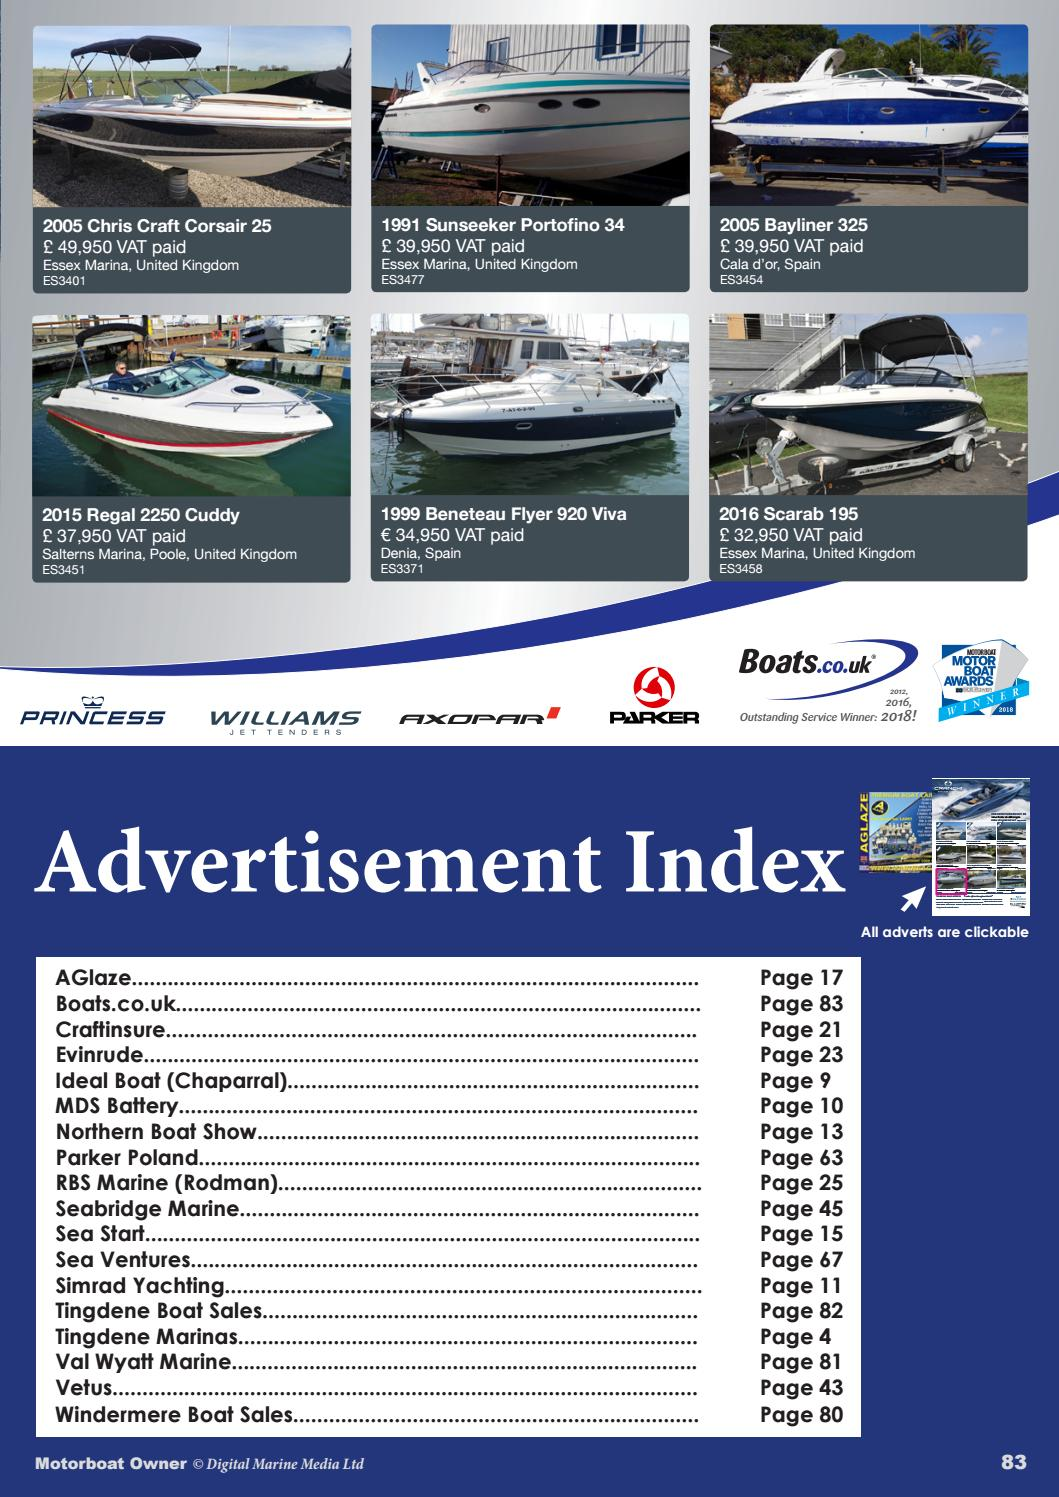 Motorboat Owner May 2018 by Digital Marine Media Ltd - issuu